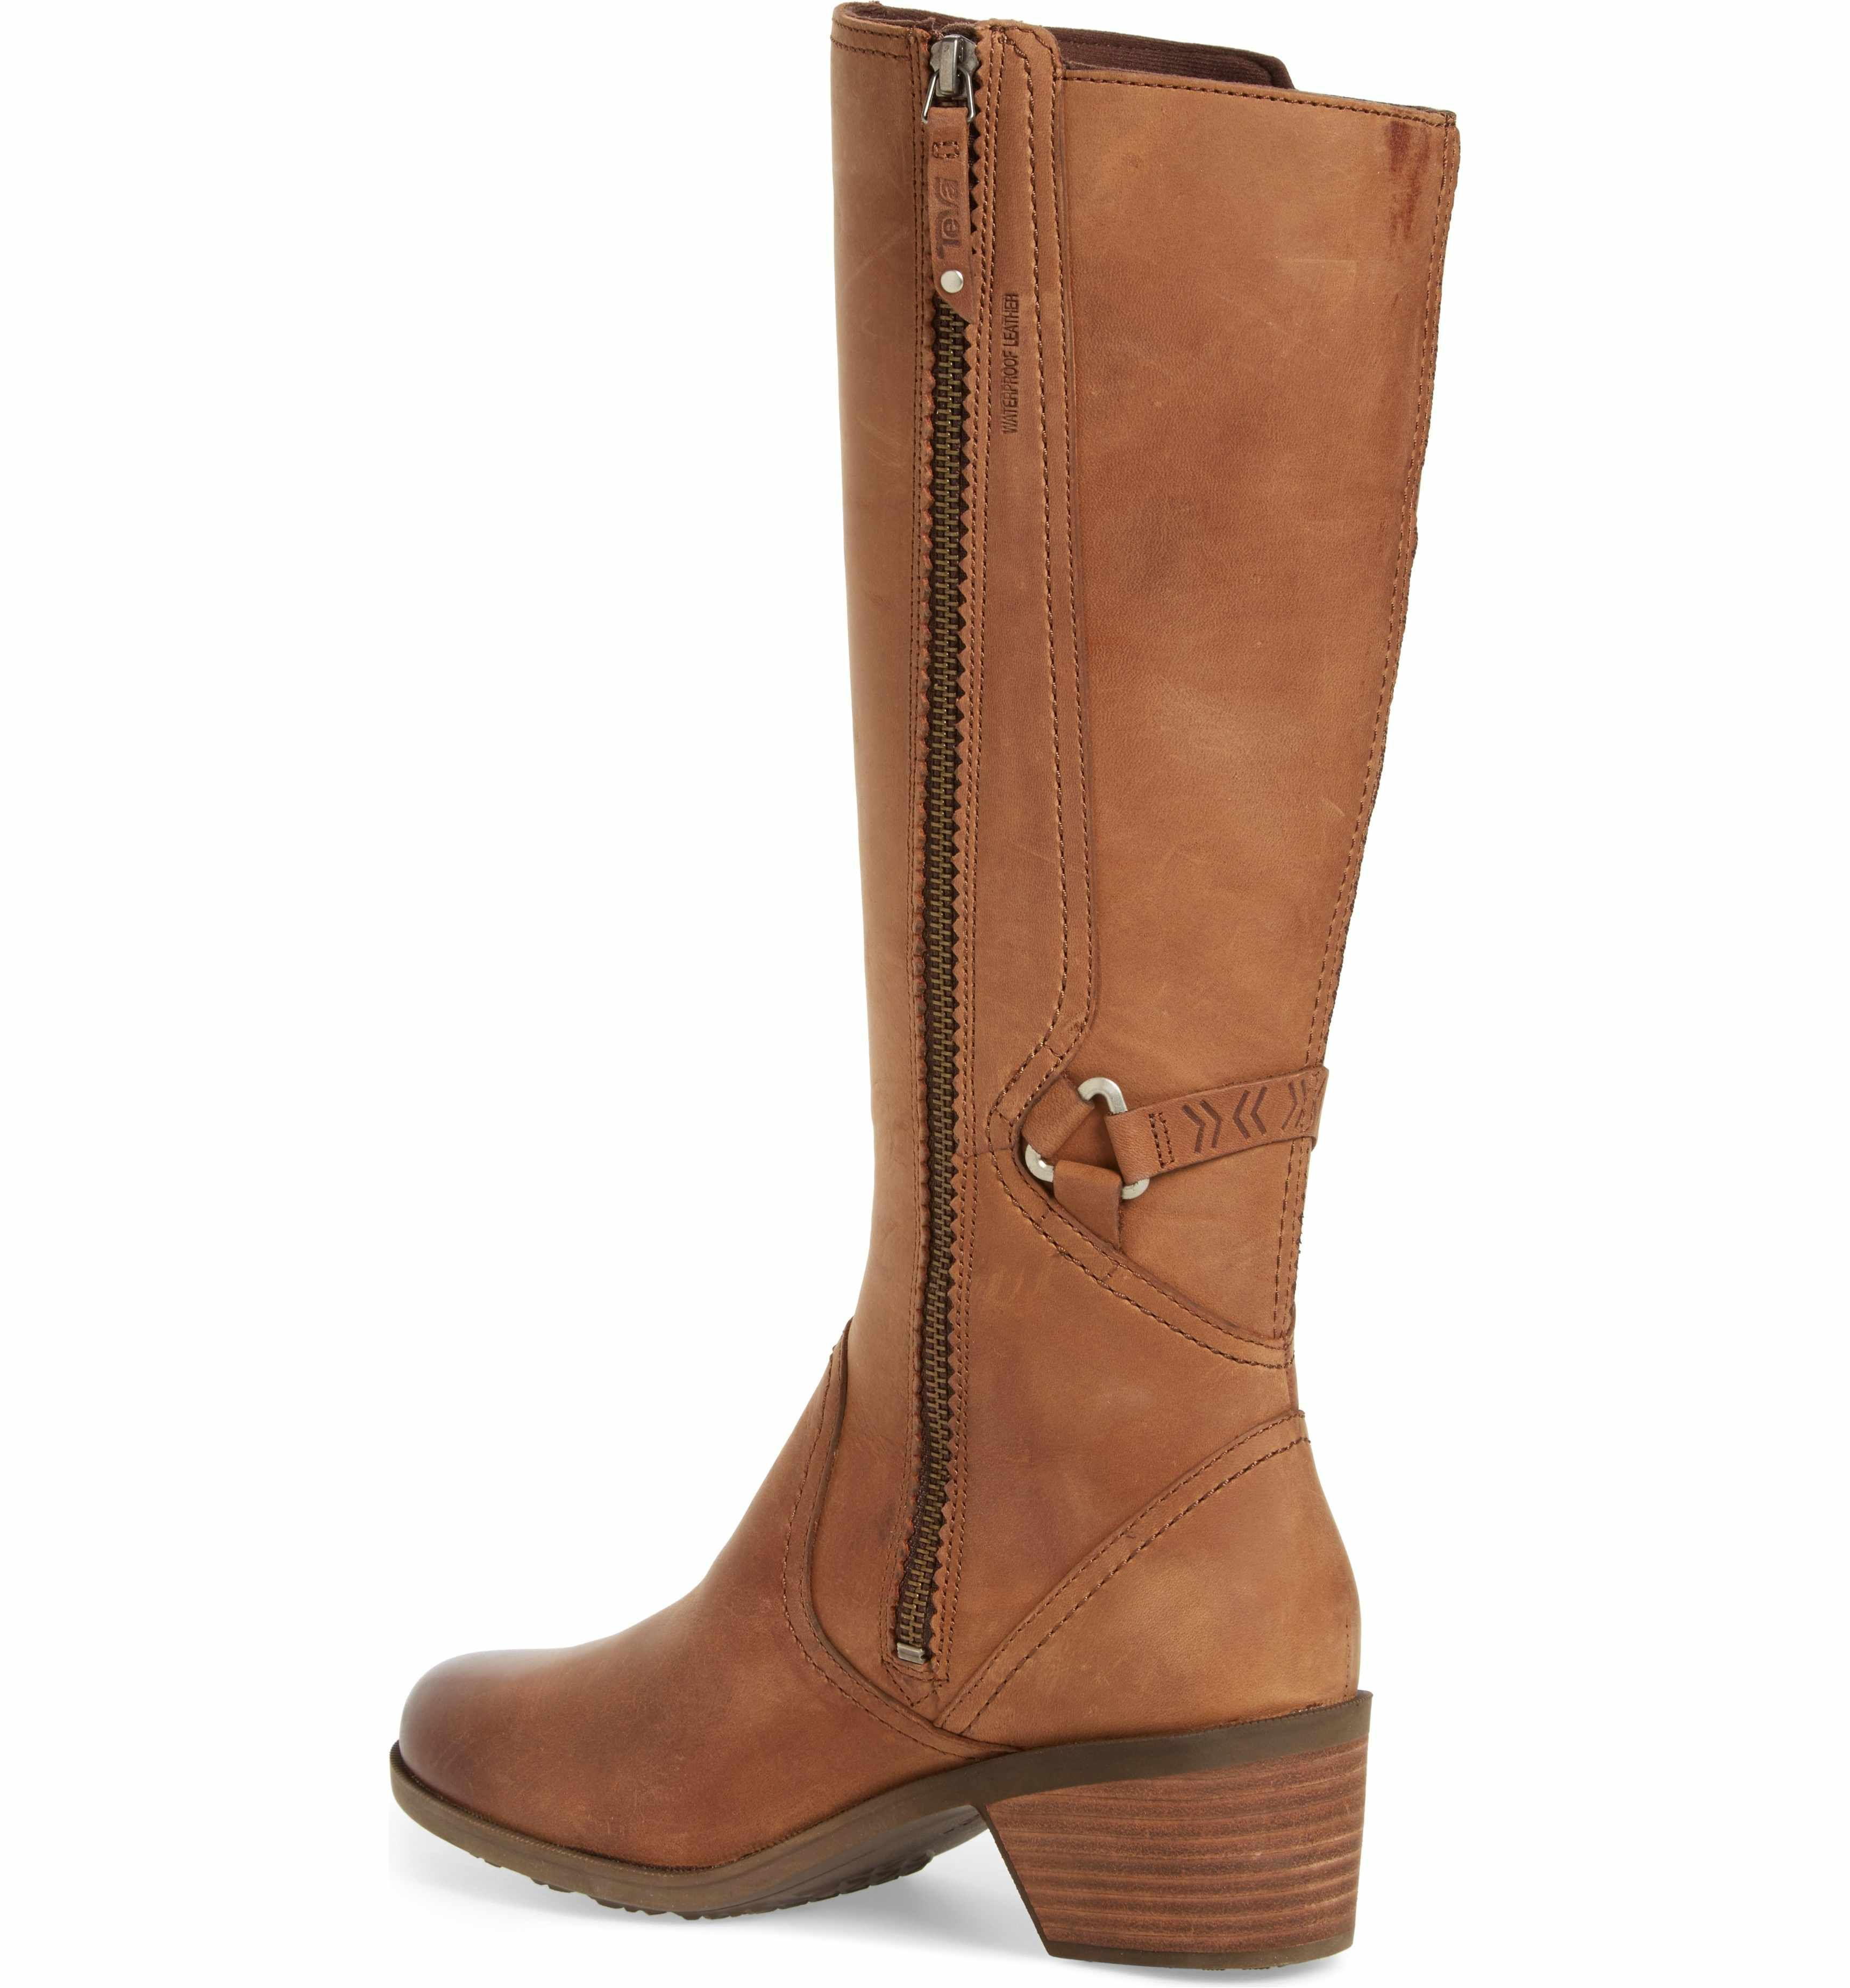 b2b360b8c Main Image - Teva Foxy Waterproof Boot (Women) Brown Fall Boots